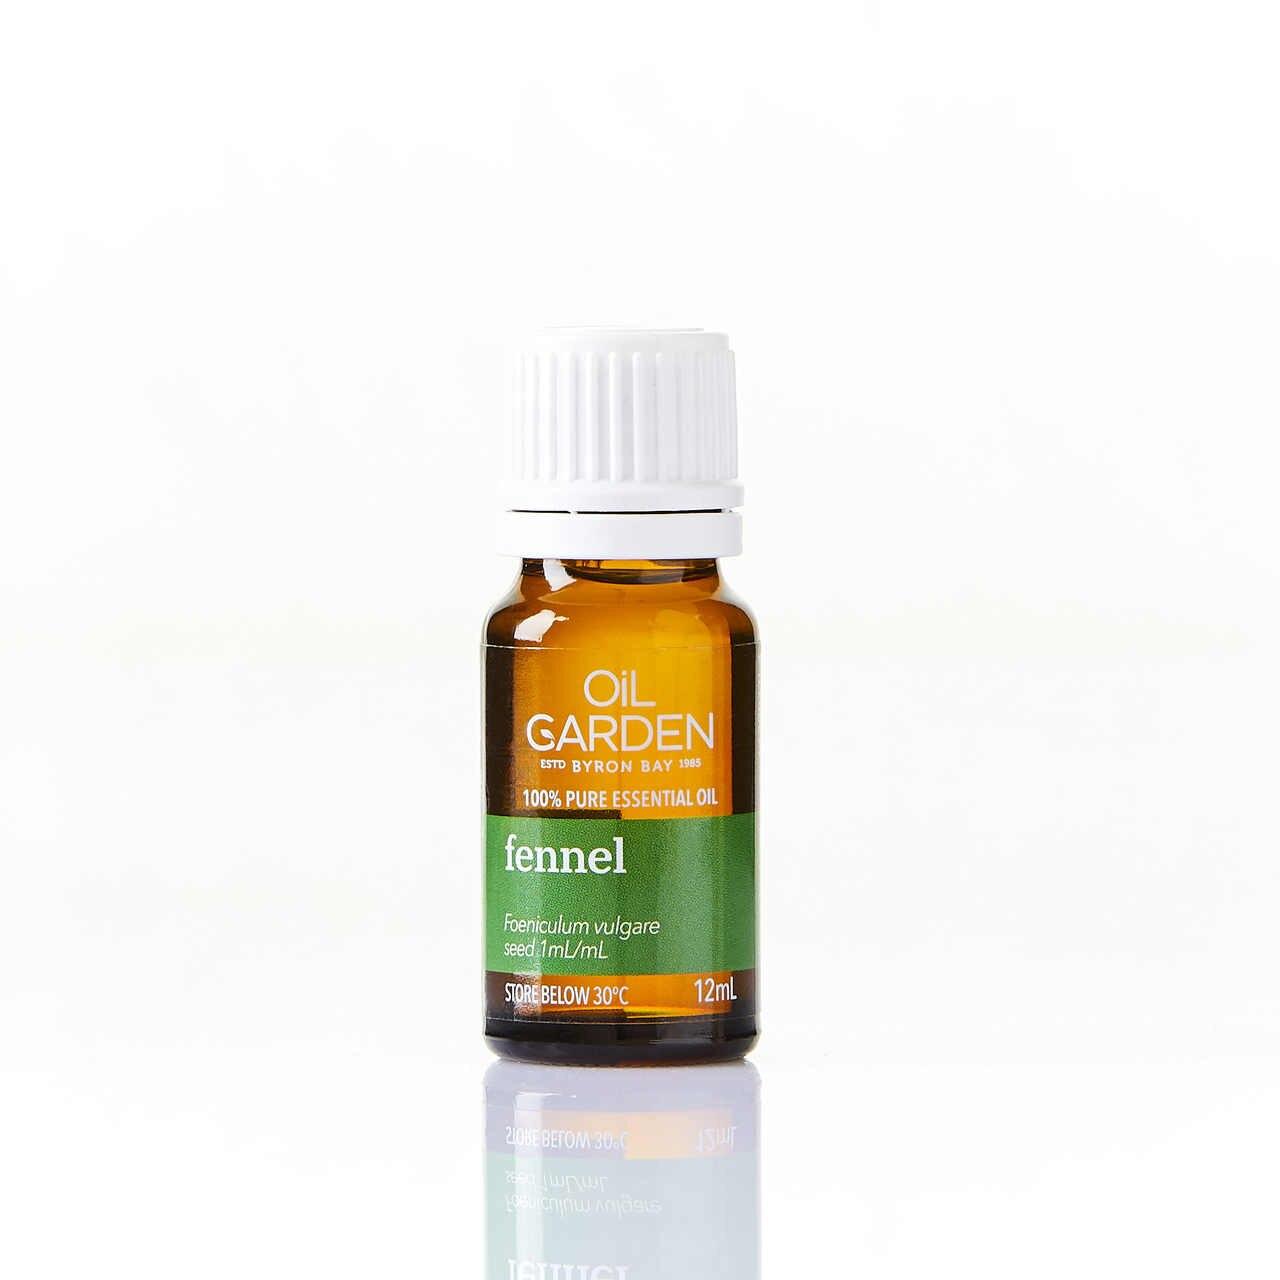 Oil Garden Fennel Pure Essential Oil 12mL 6620037